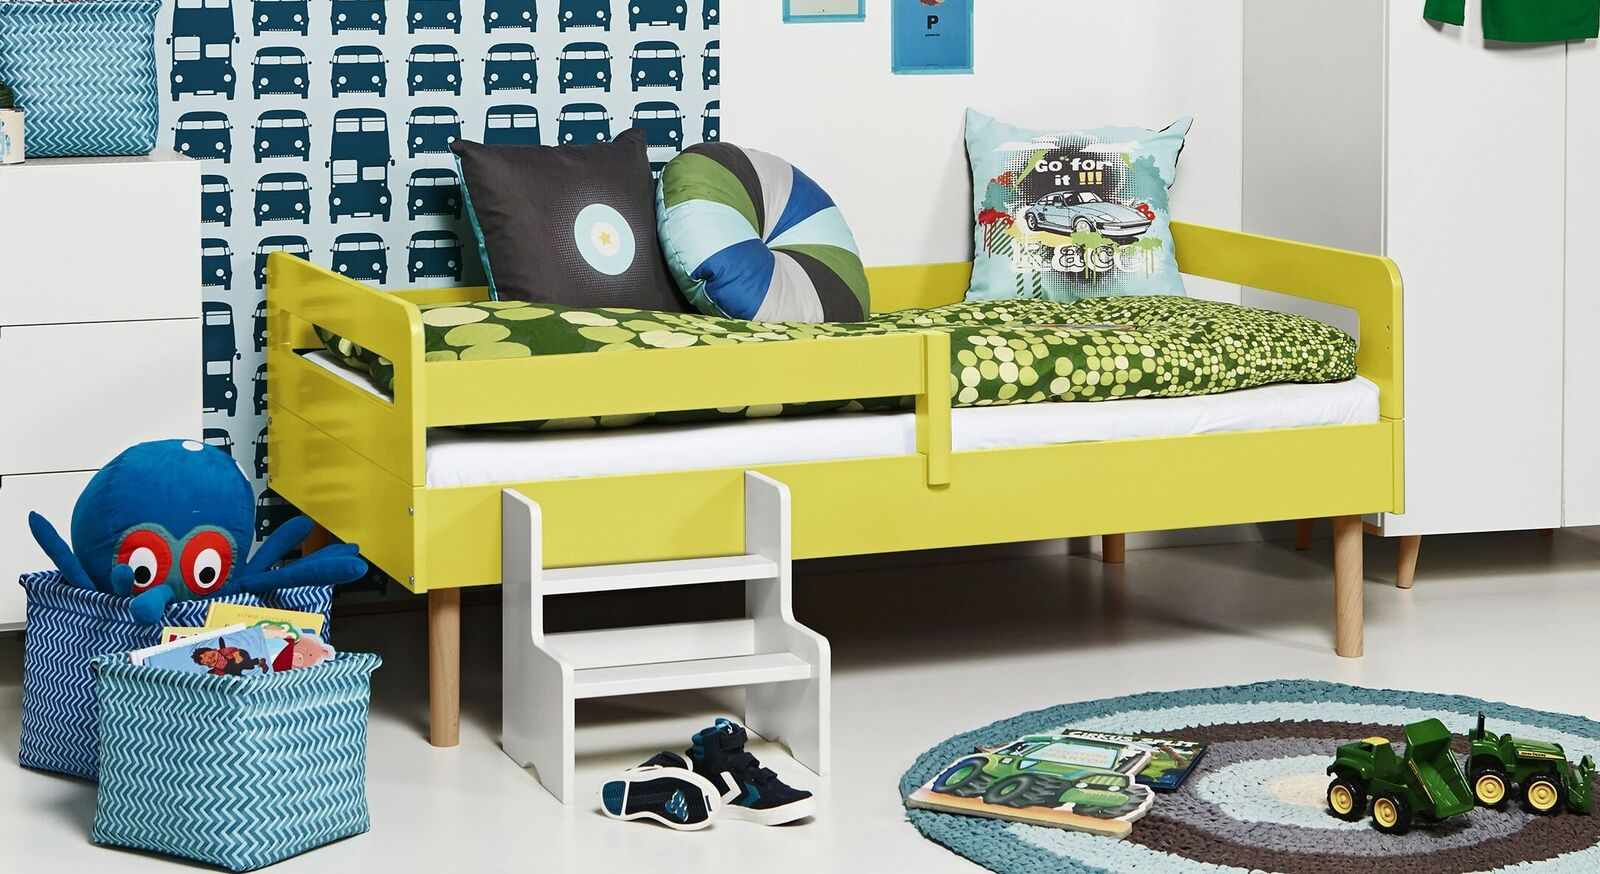 Modernes Kinderbett Kids Town Retro aus gelbem MDF